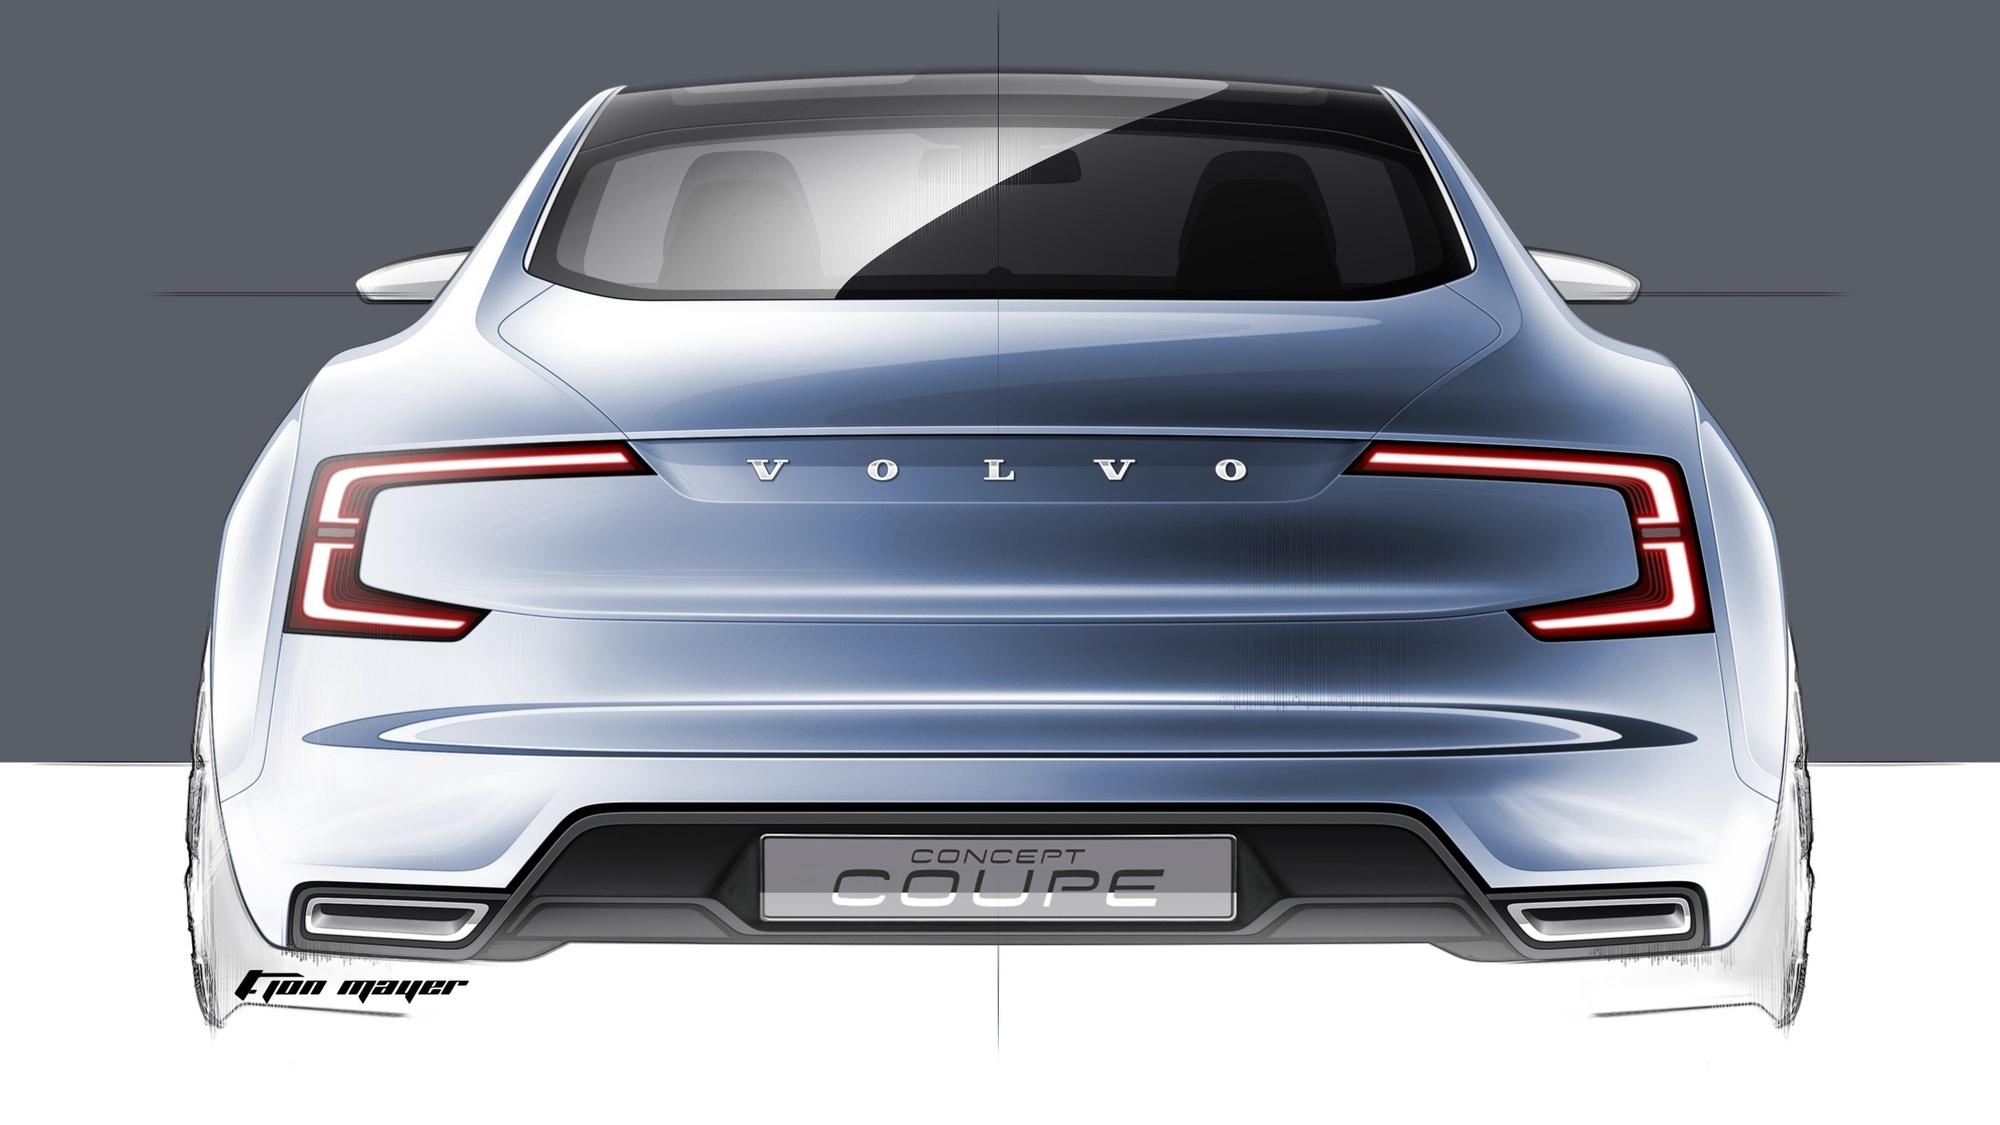 2016 Volvo Coupe | Concept Coupe